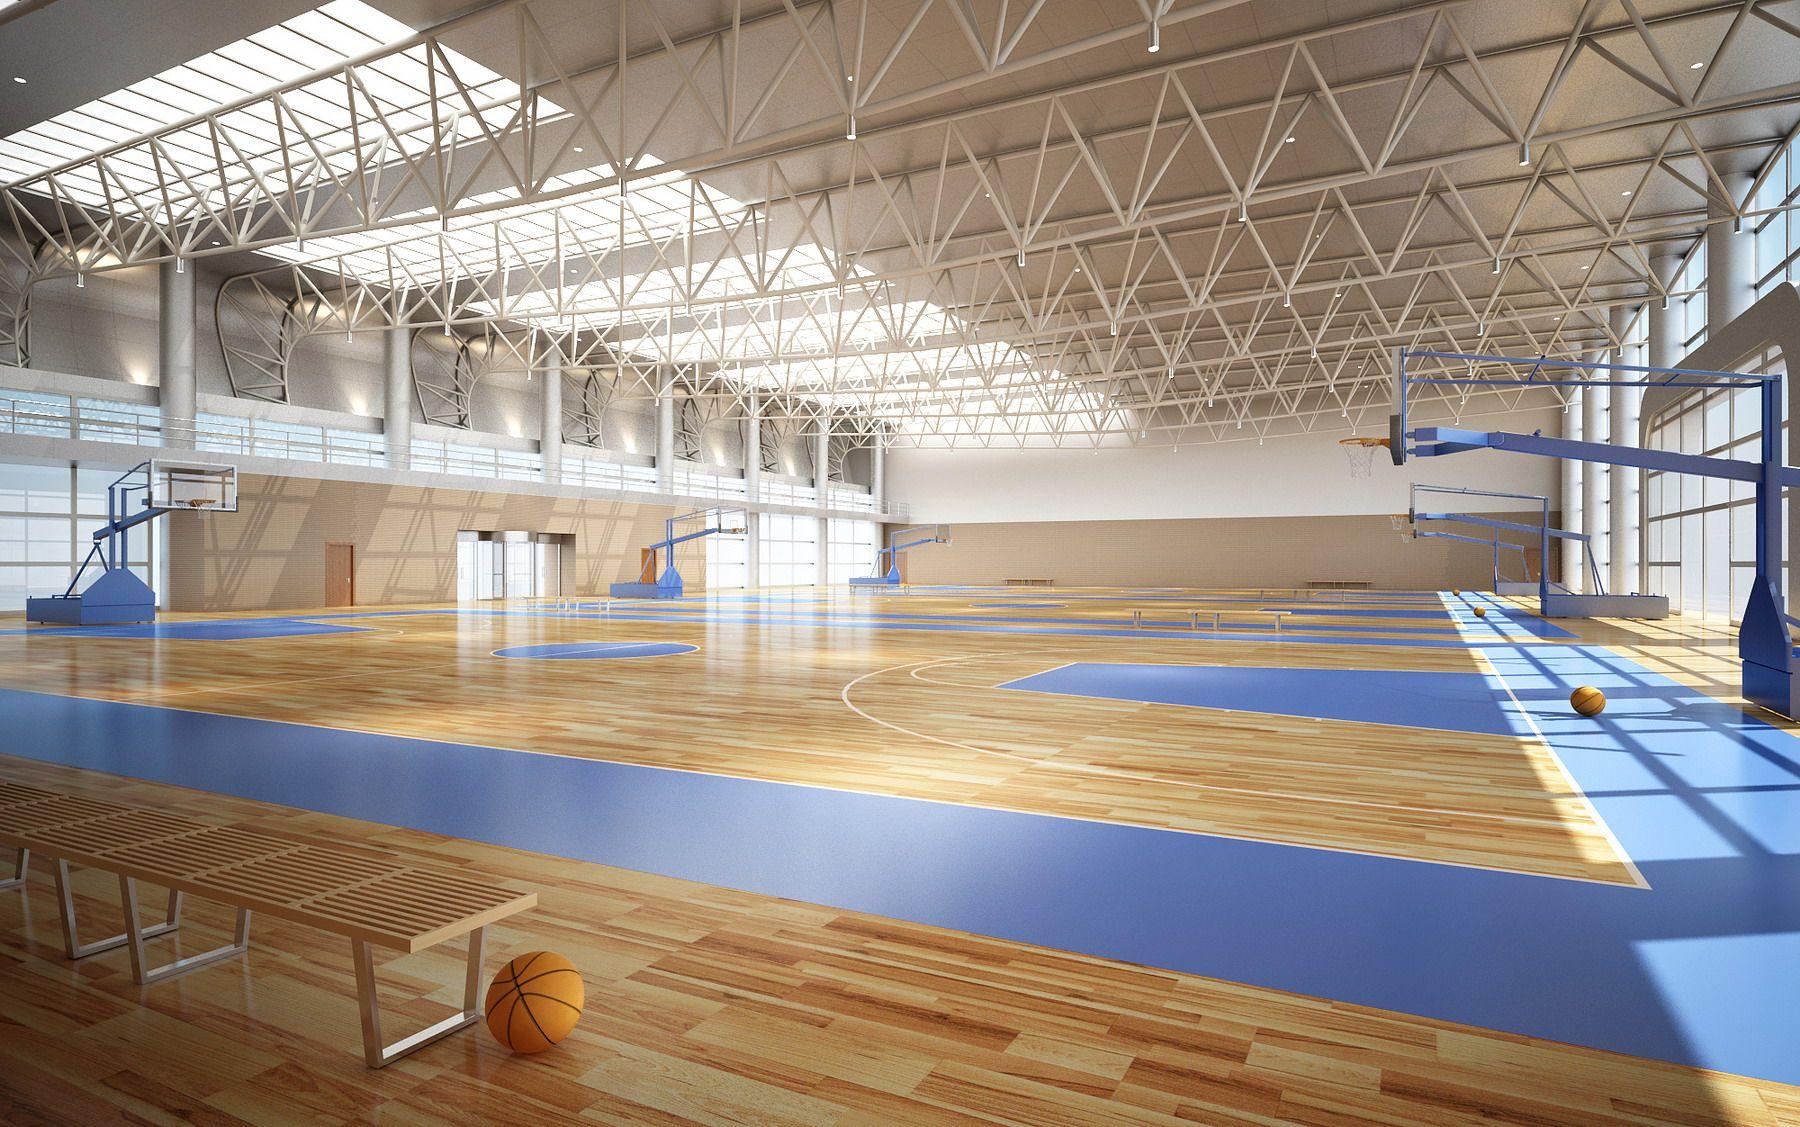 Basketball Gymnasium Arena 3d Model Flatpyramid Stadium Design Stadium Architecture Modern Architecture